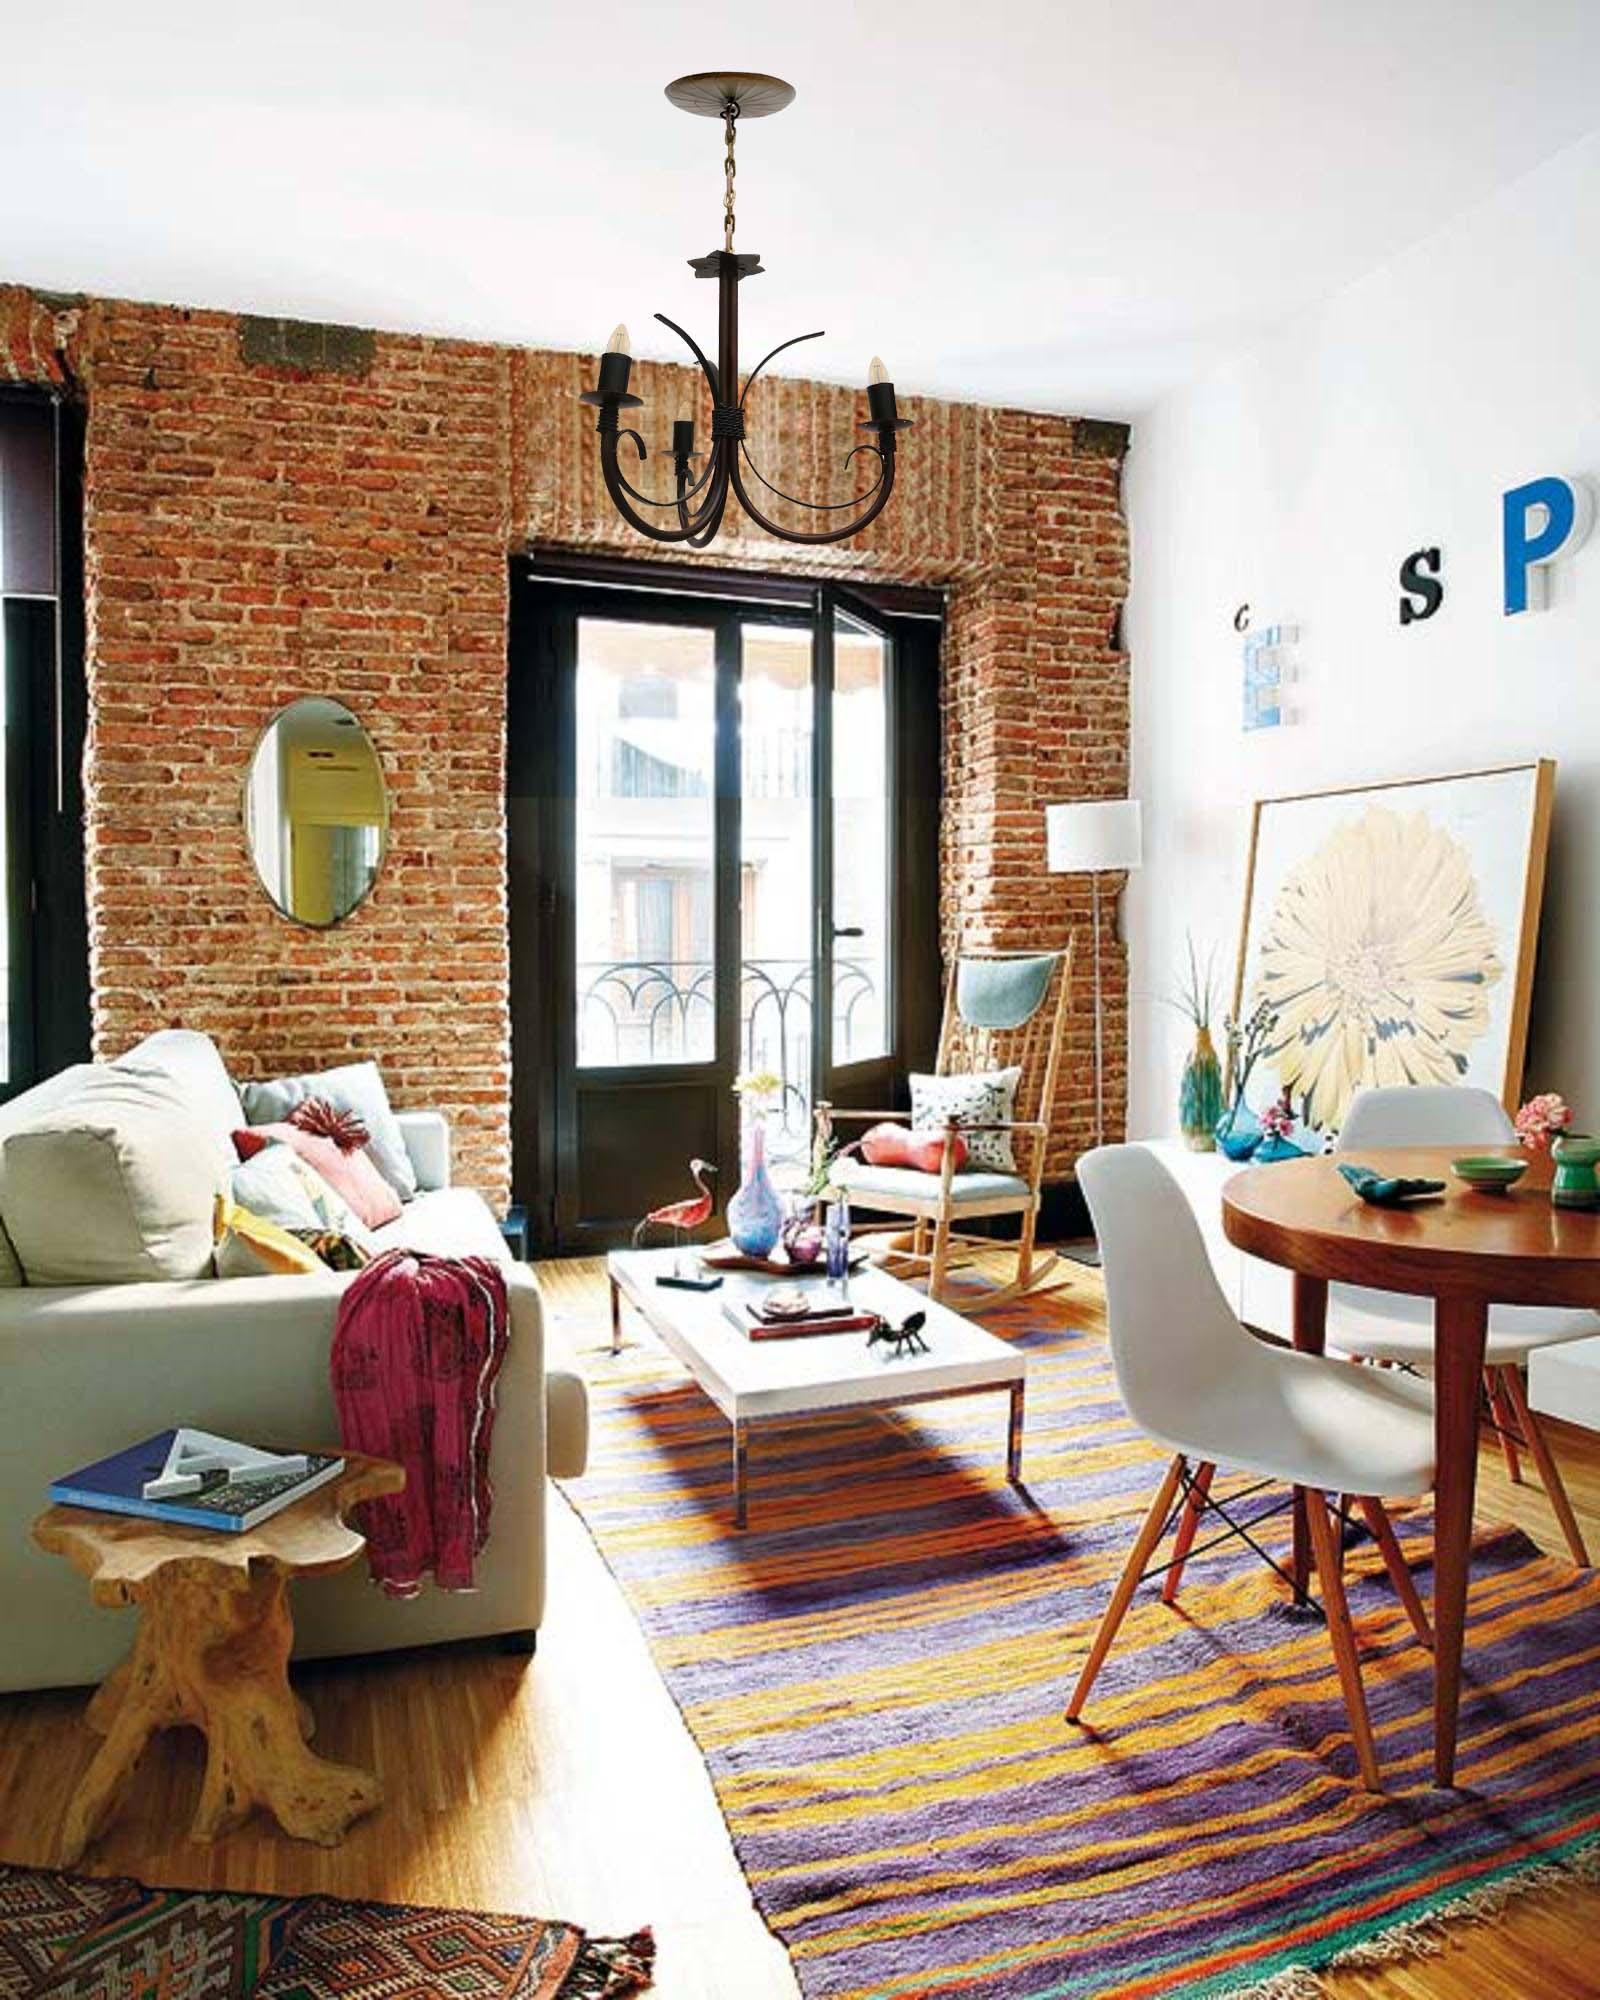 Lustre Artesanal Rustico Para Sala de Jantar Simples De Apartamento